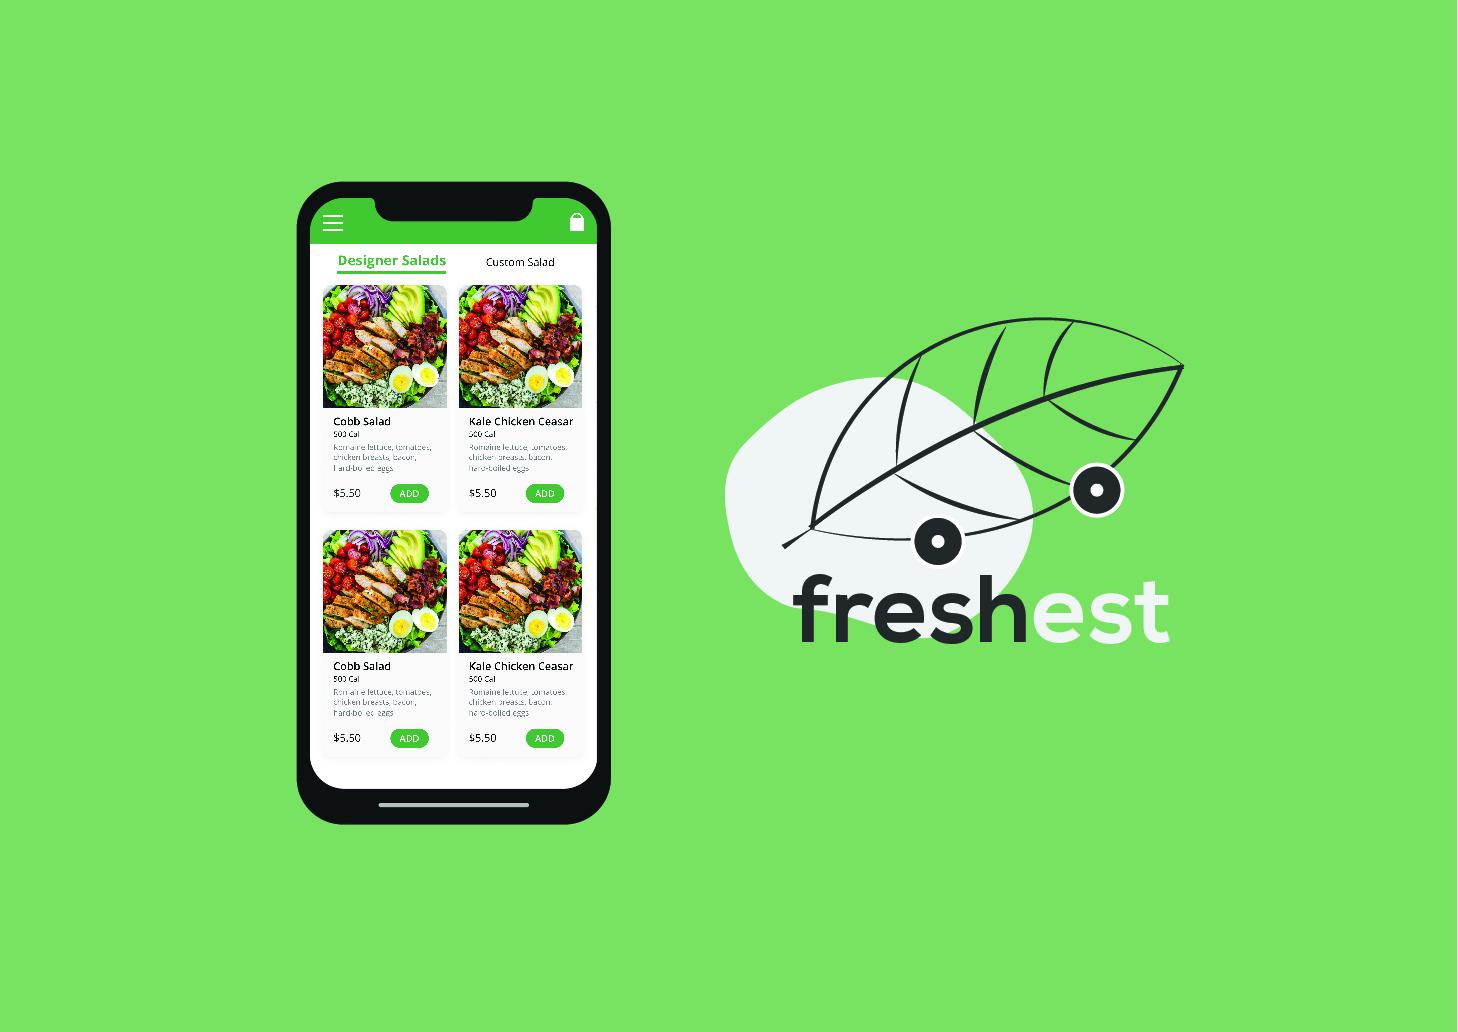 freshest@2x-100.jpg